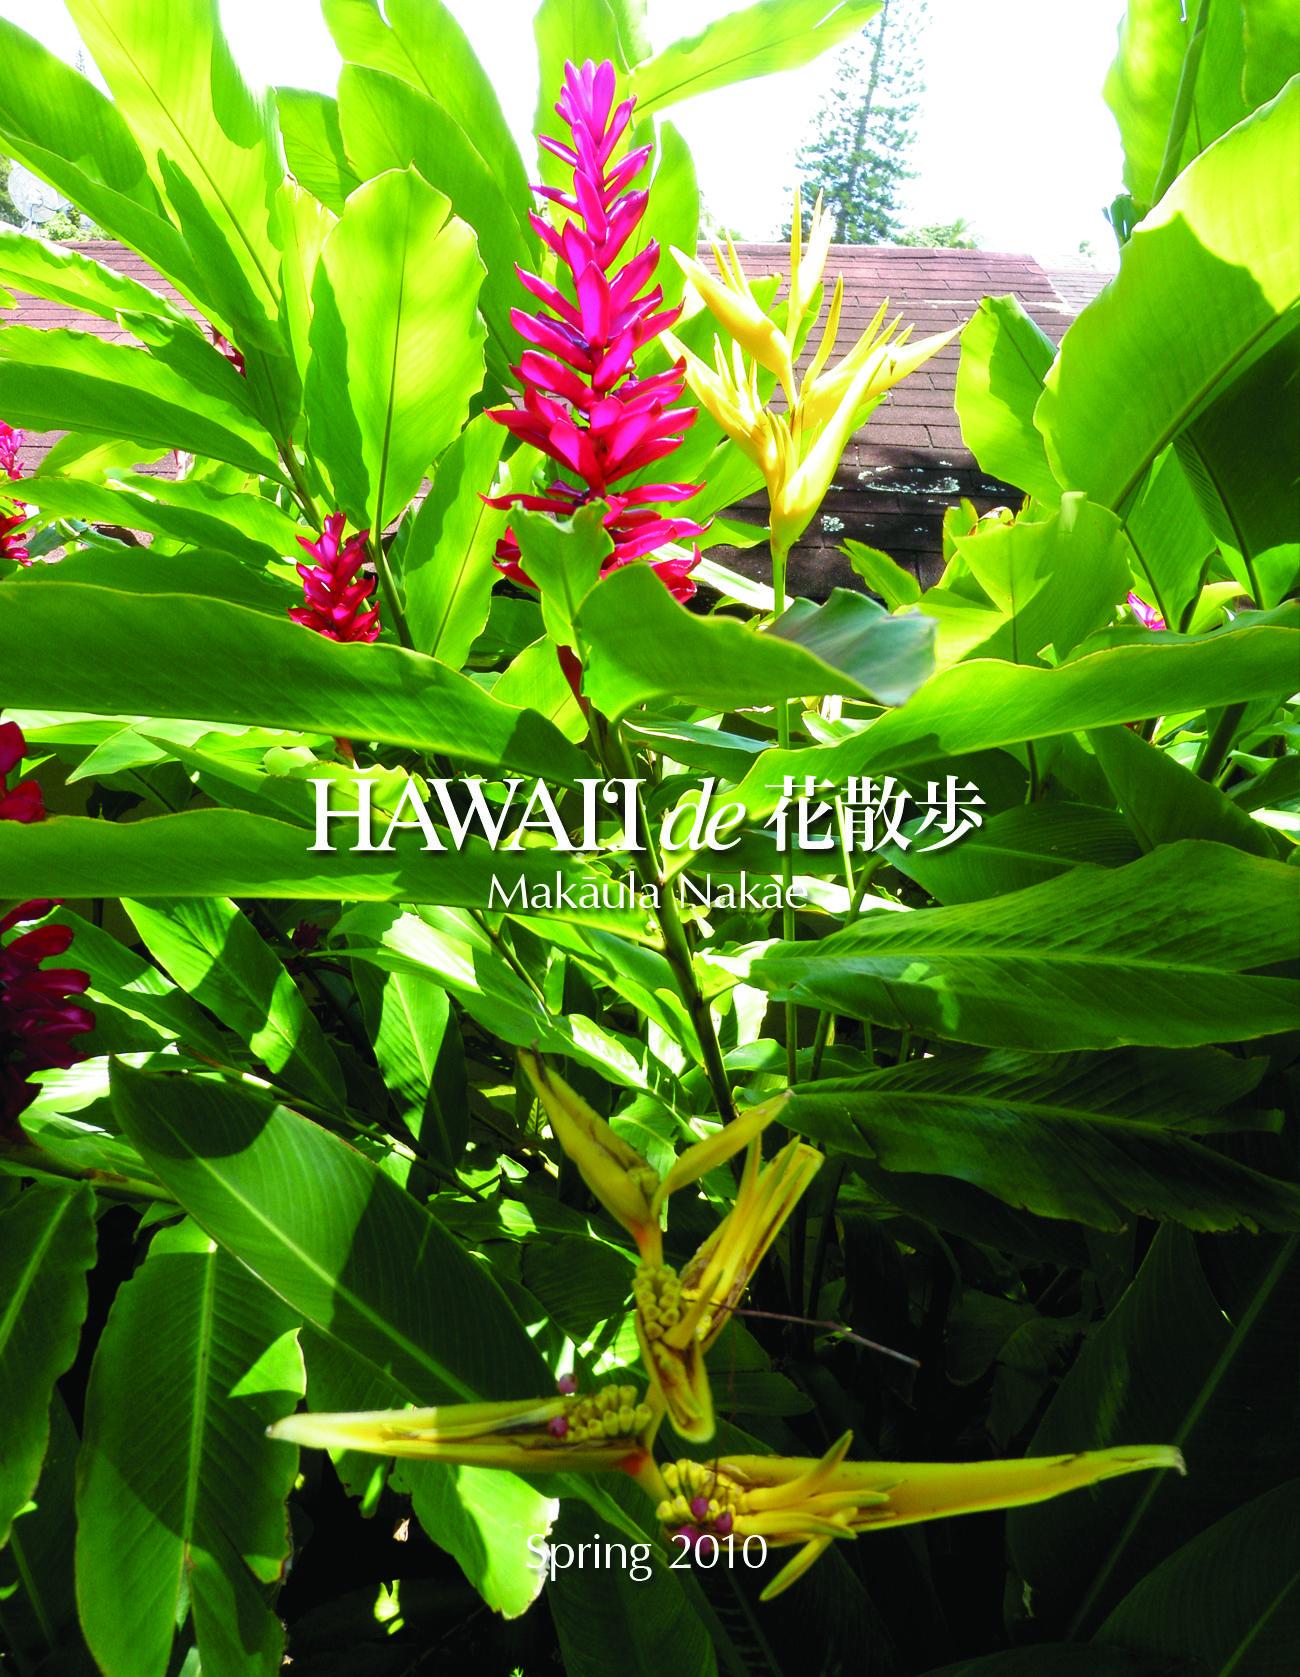 plumeria@st. louis heights hawaii